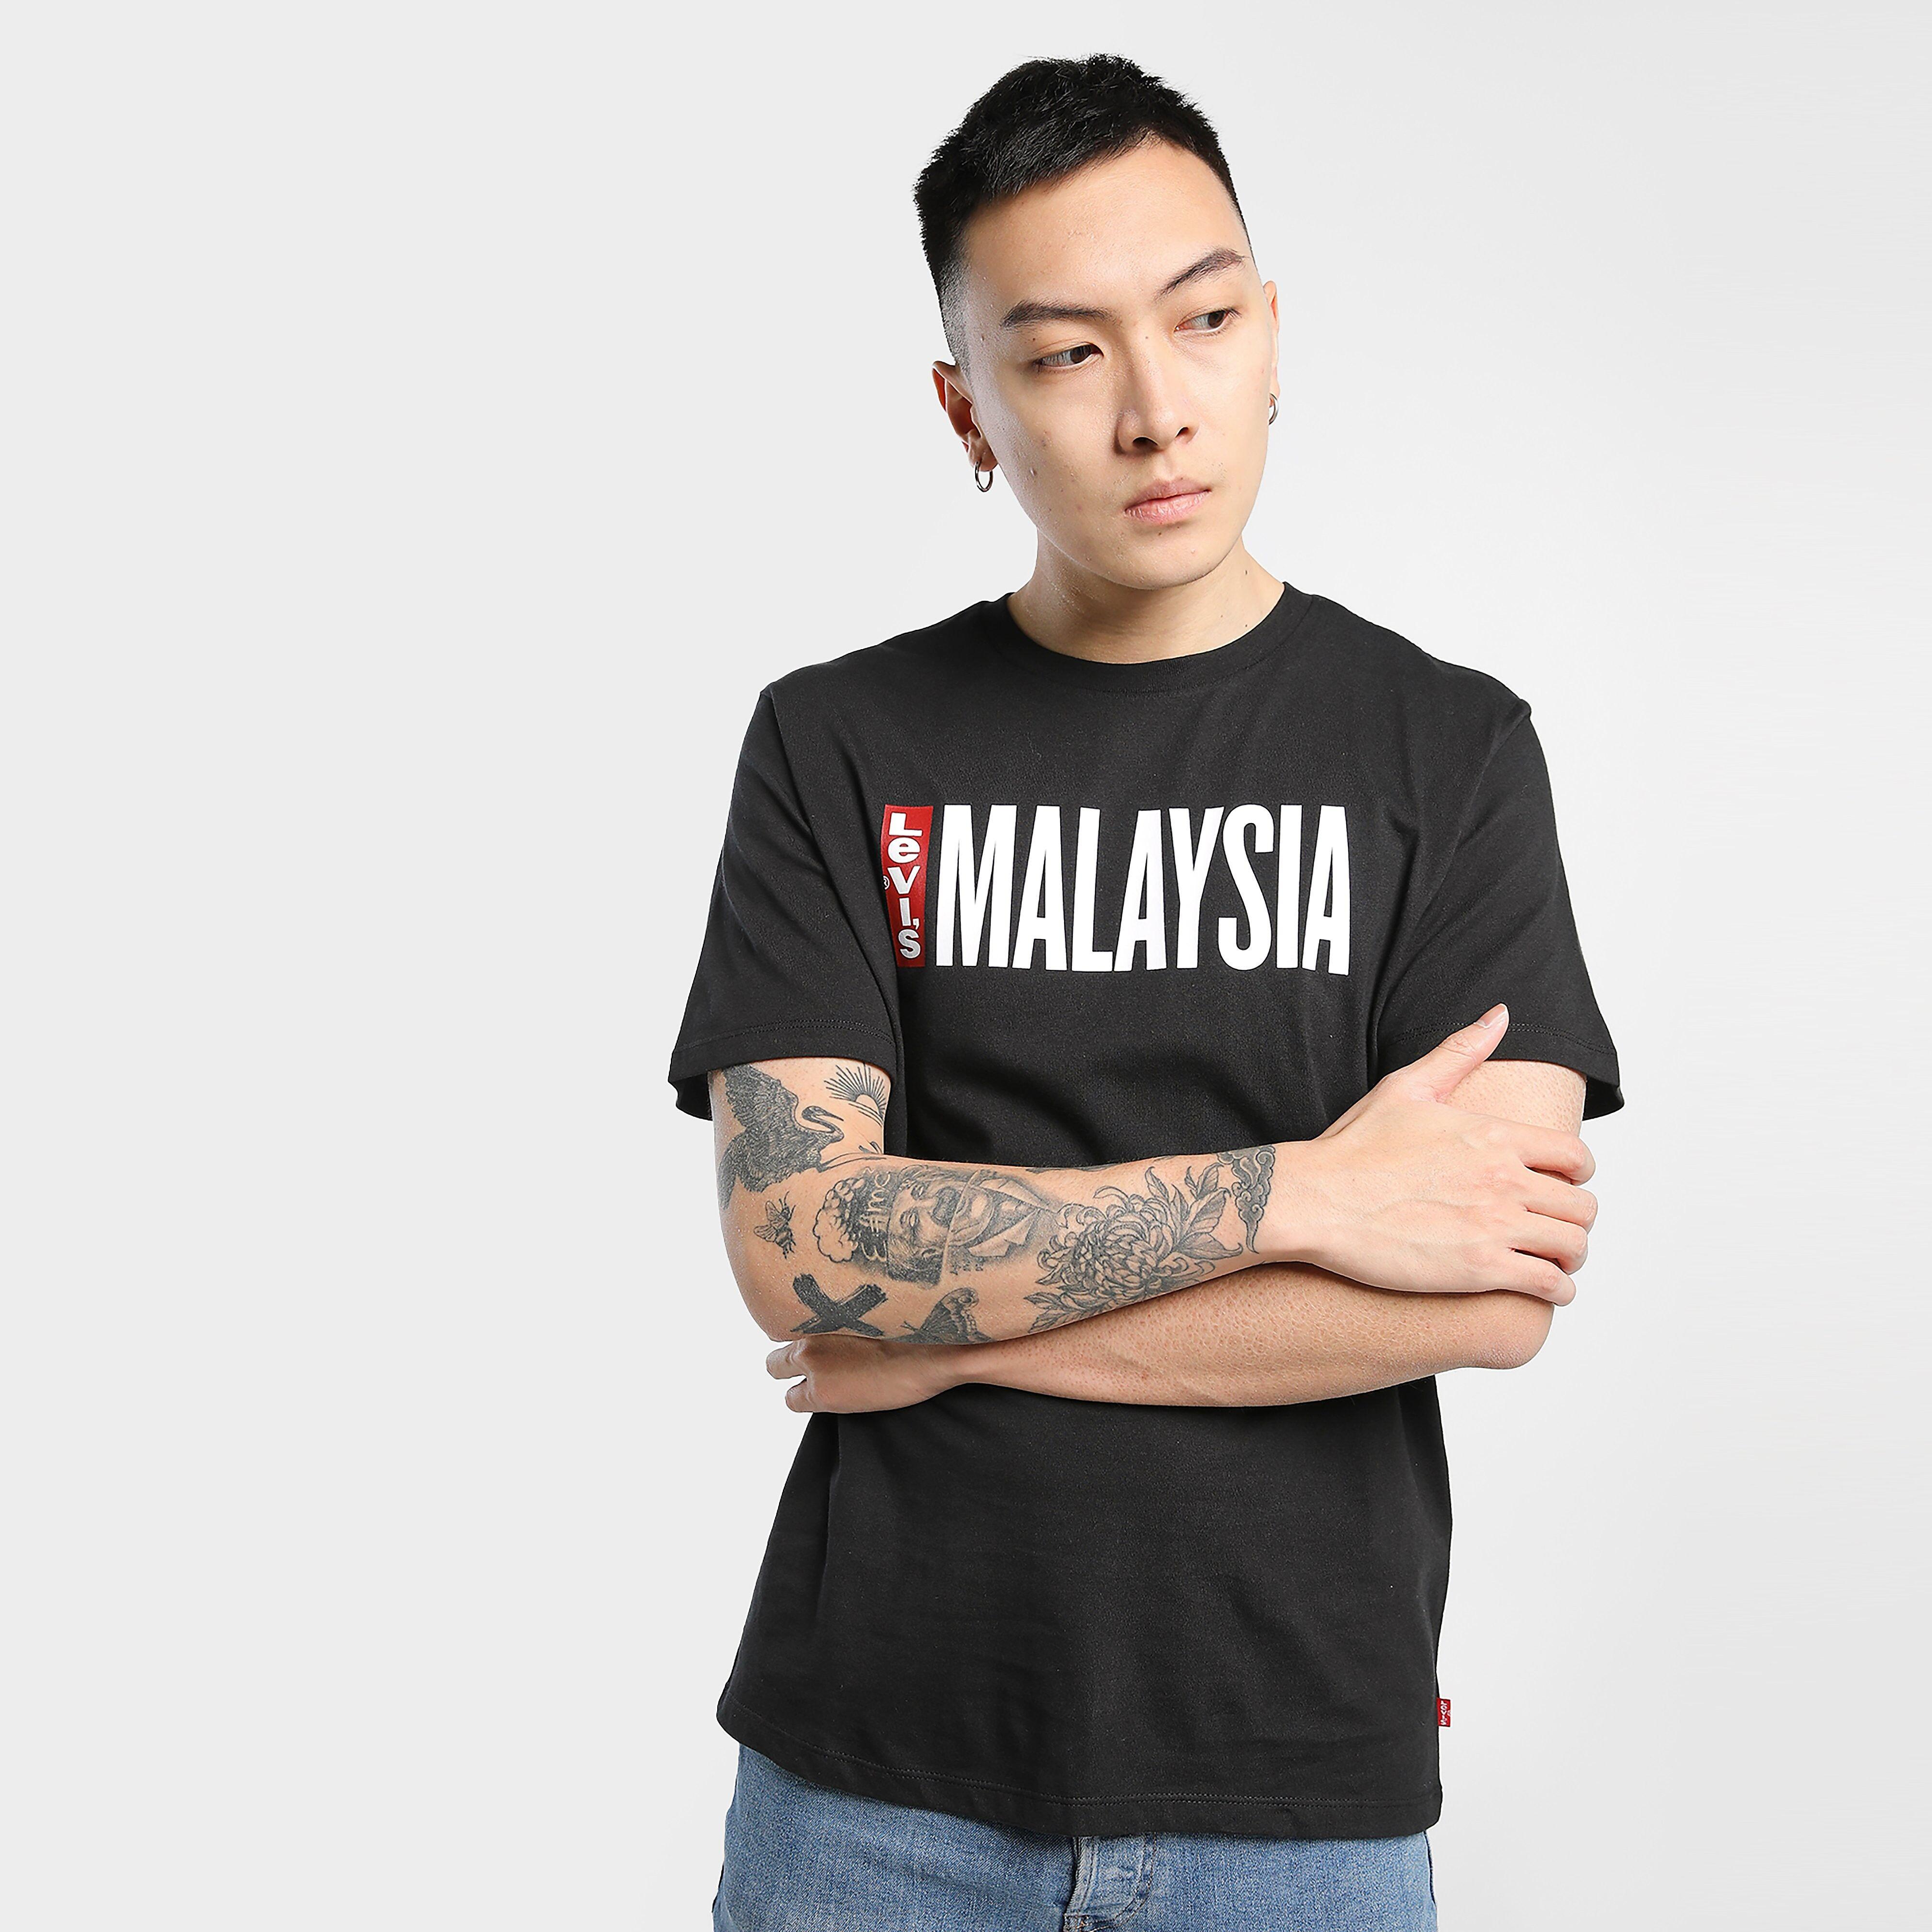 Levi's MALAYSIA TEE - BLACK